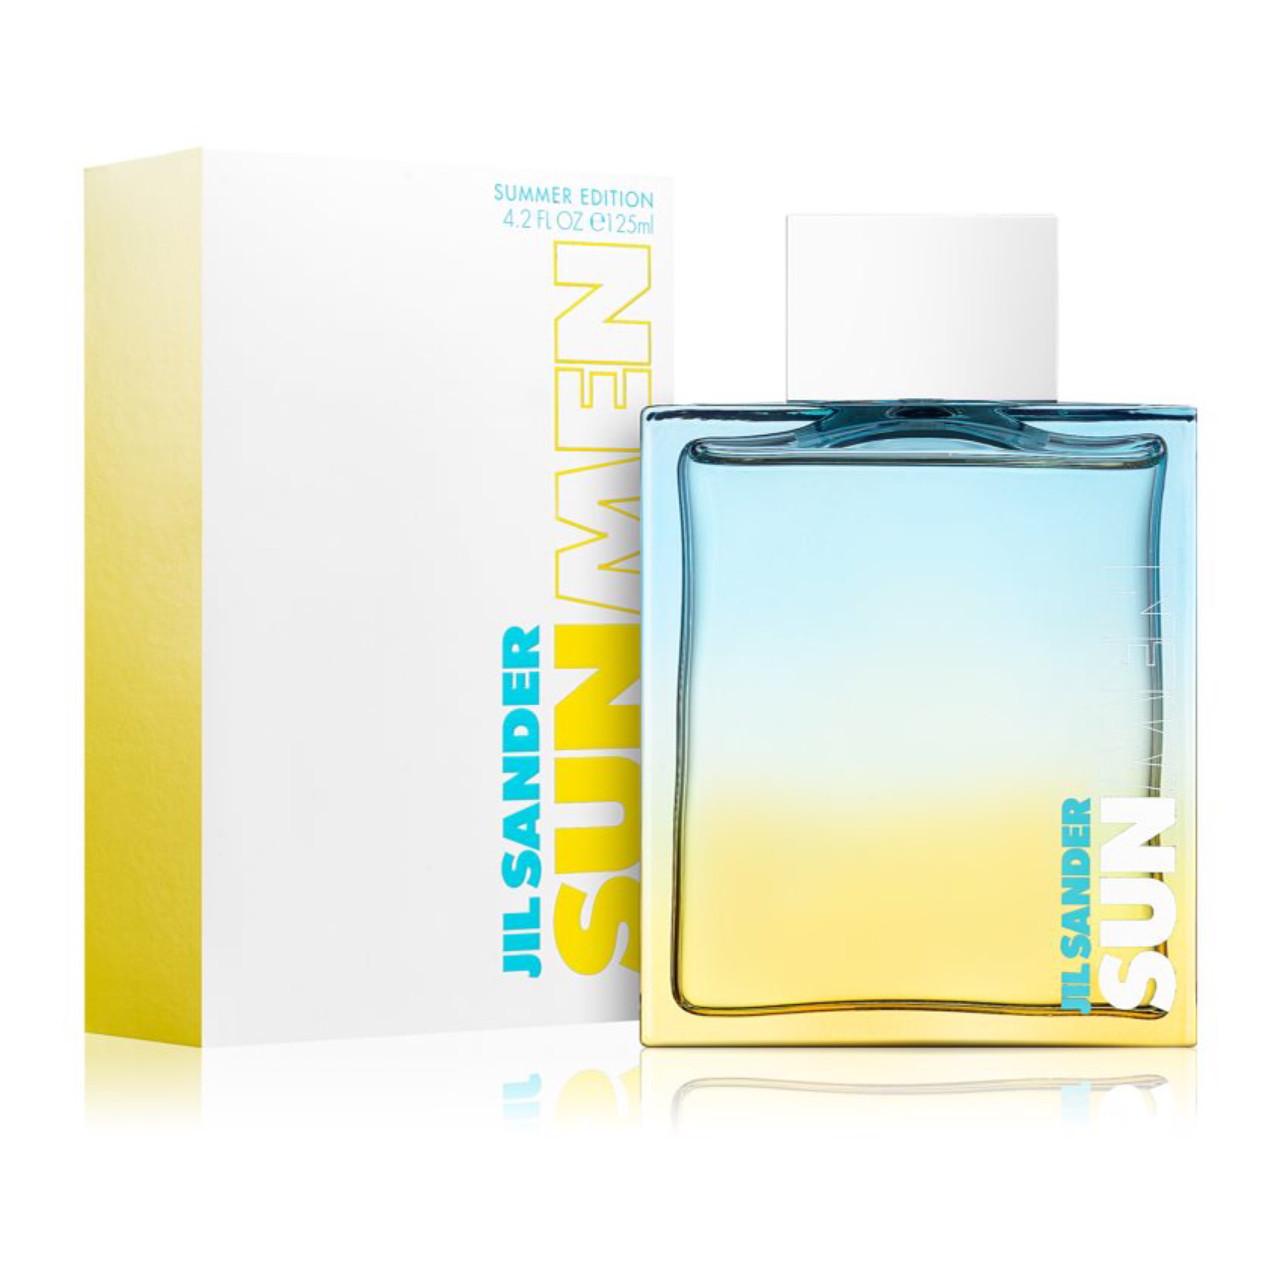 Новый летний аромат 2020 JIL SANDER Sun Men Summer Edition 125ml туалетная вода для мужчин древесный аромат